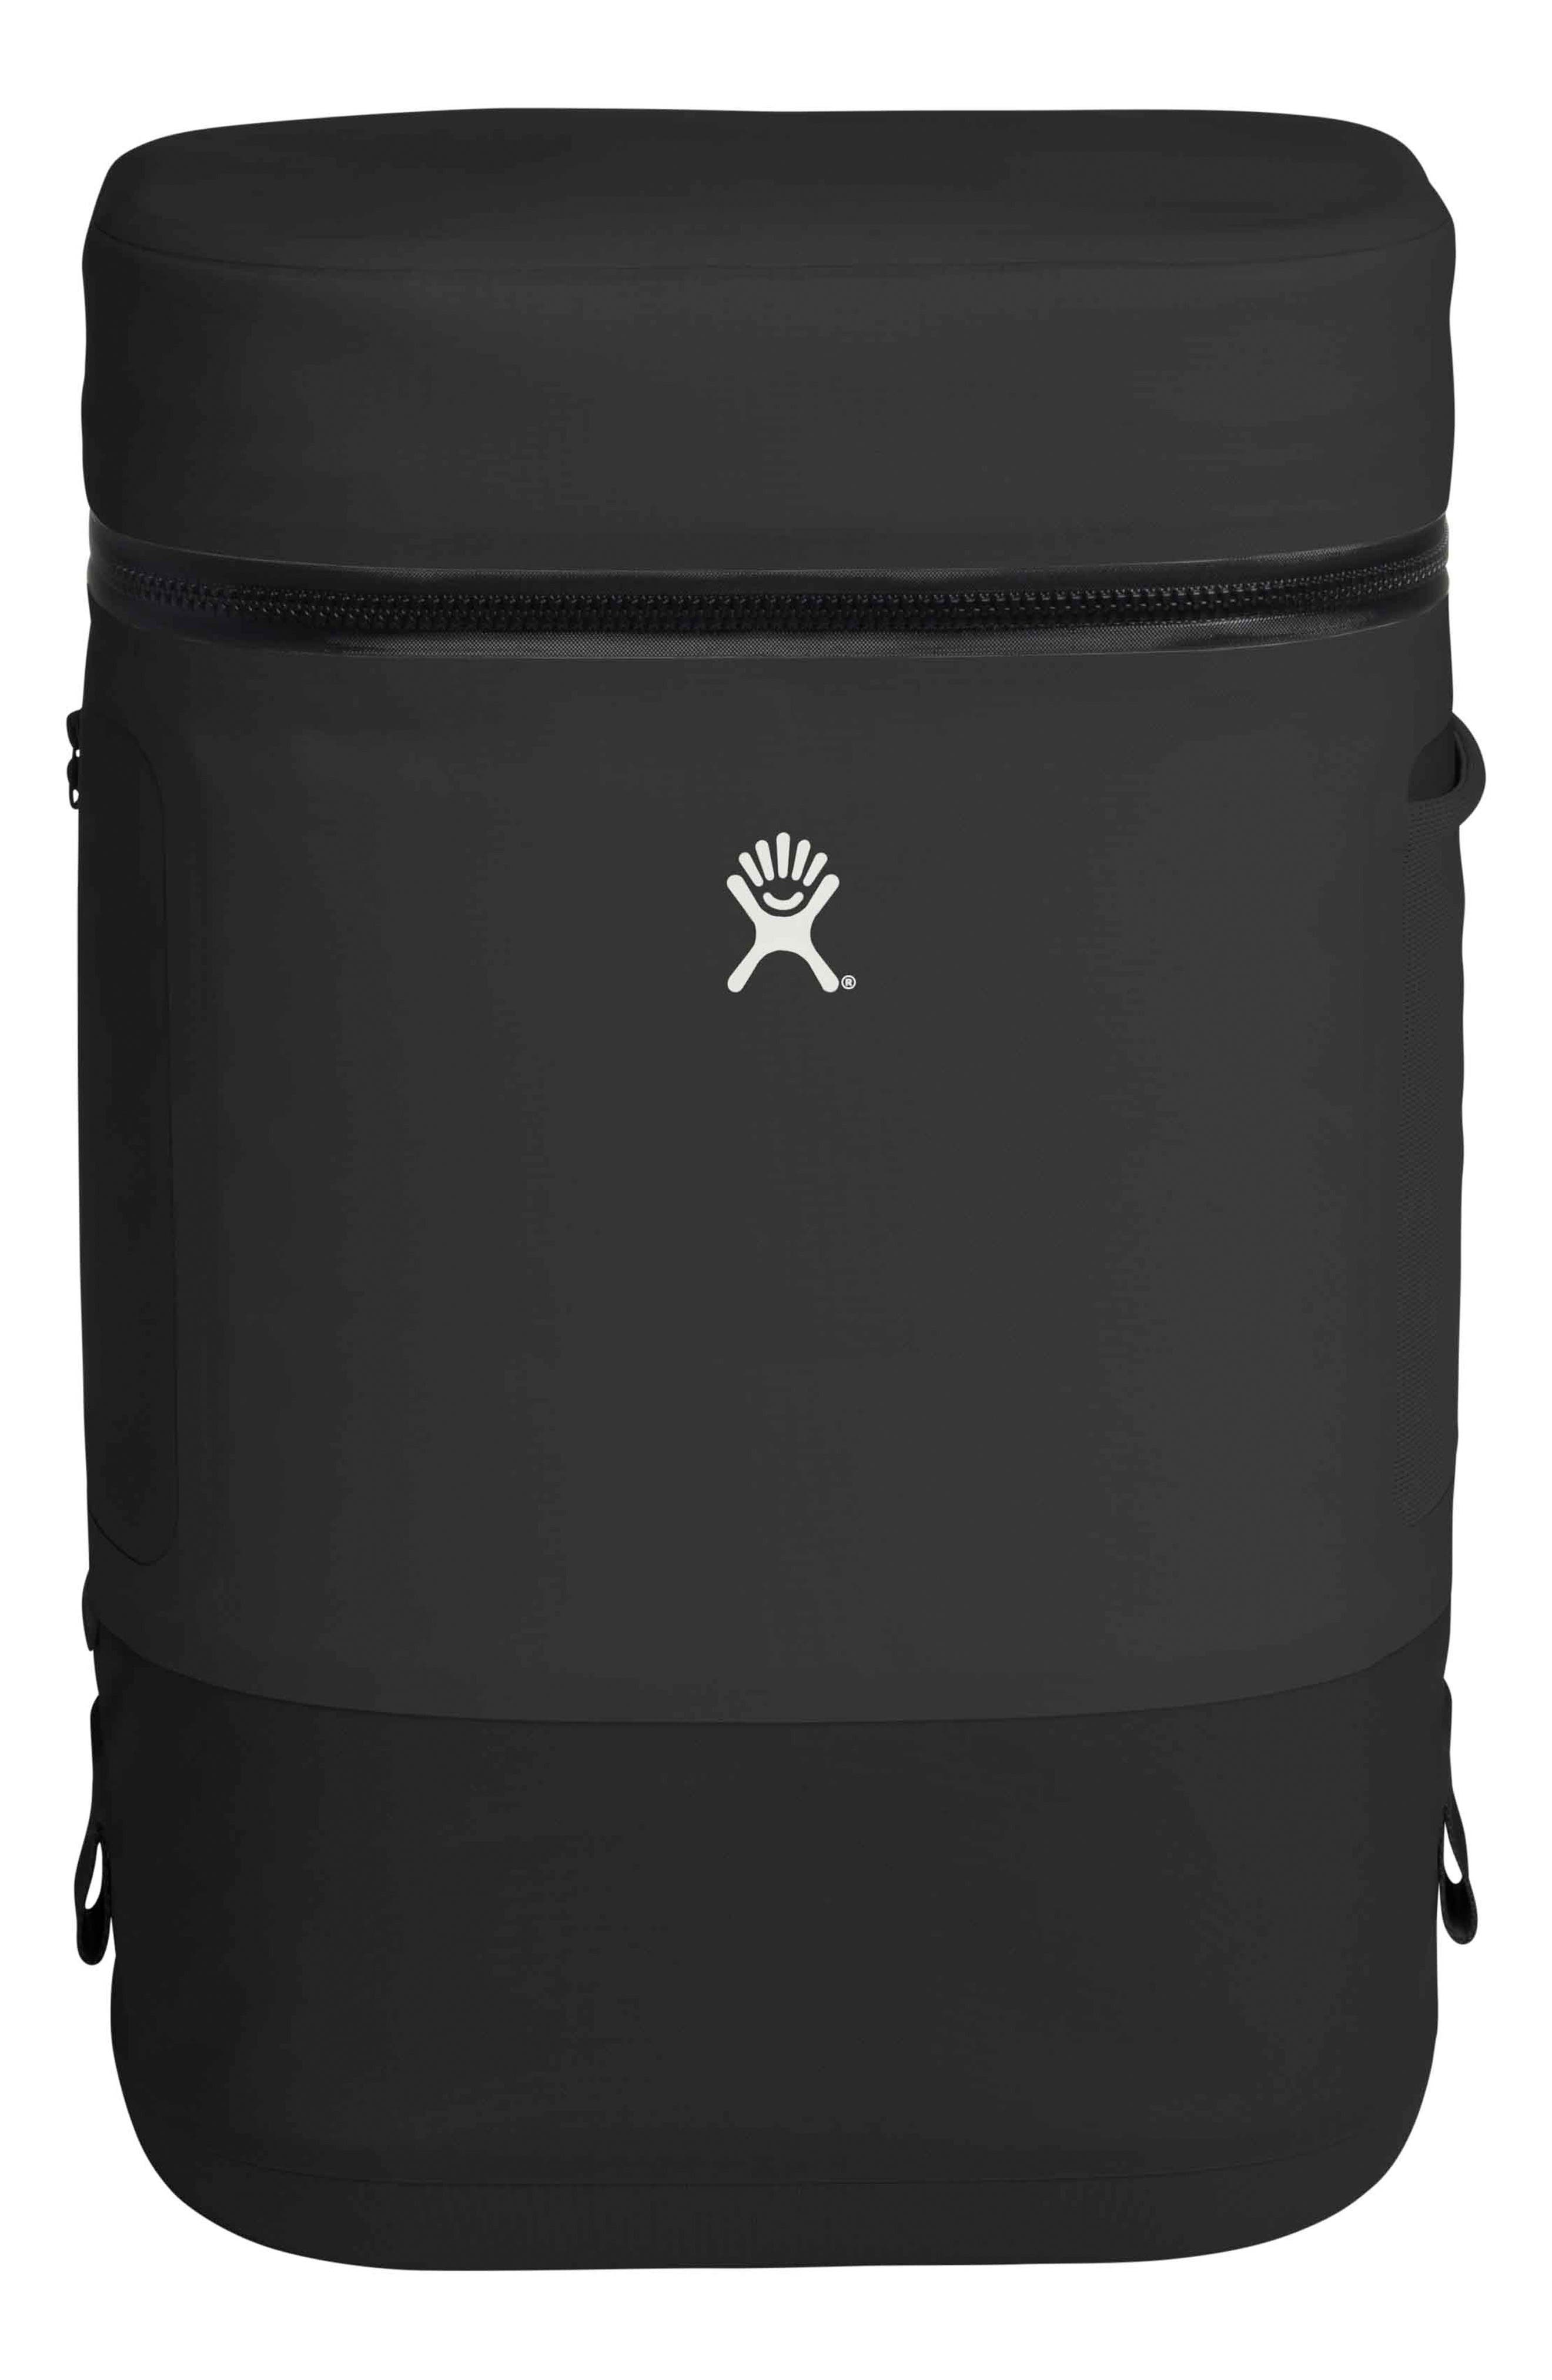 Image of Hydro Flask 22 L. Unbound Soft Cooler Pack - Black